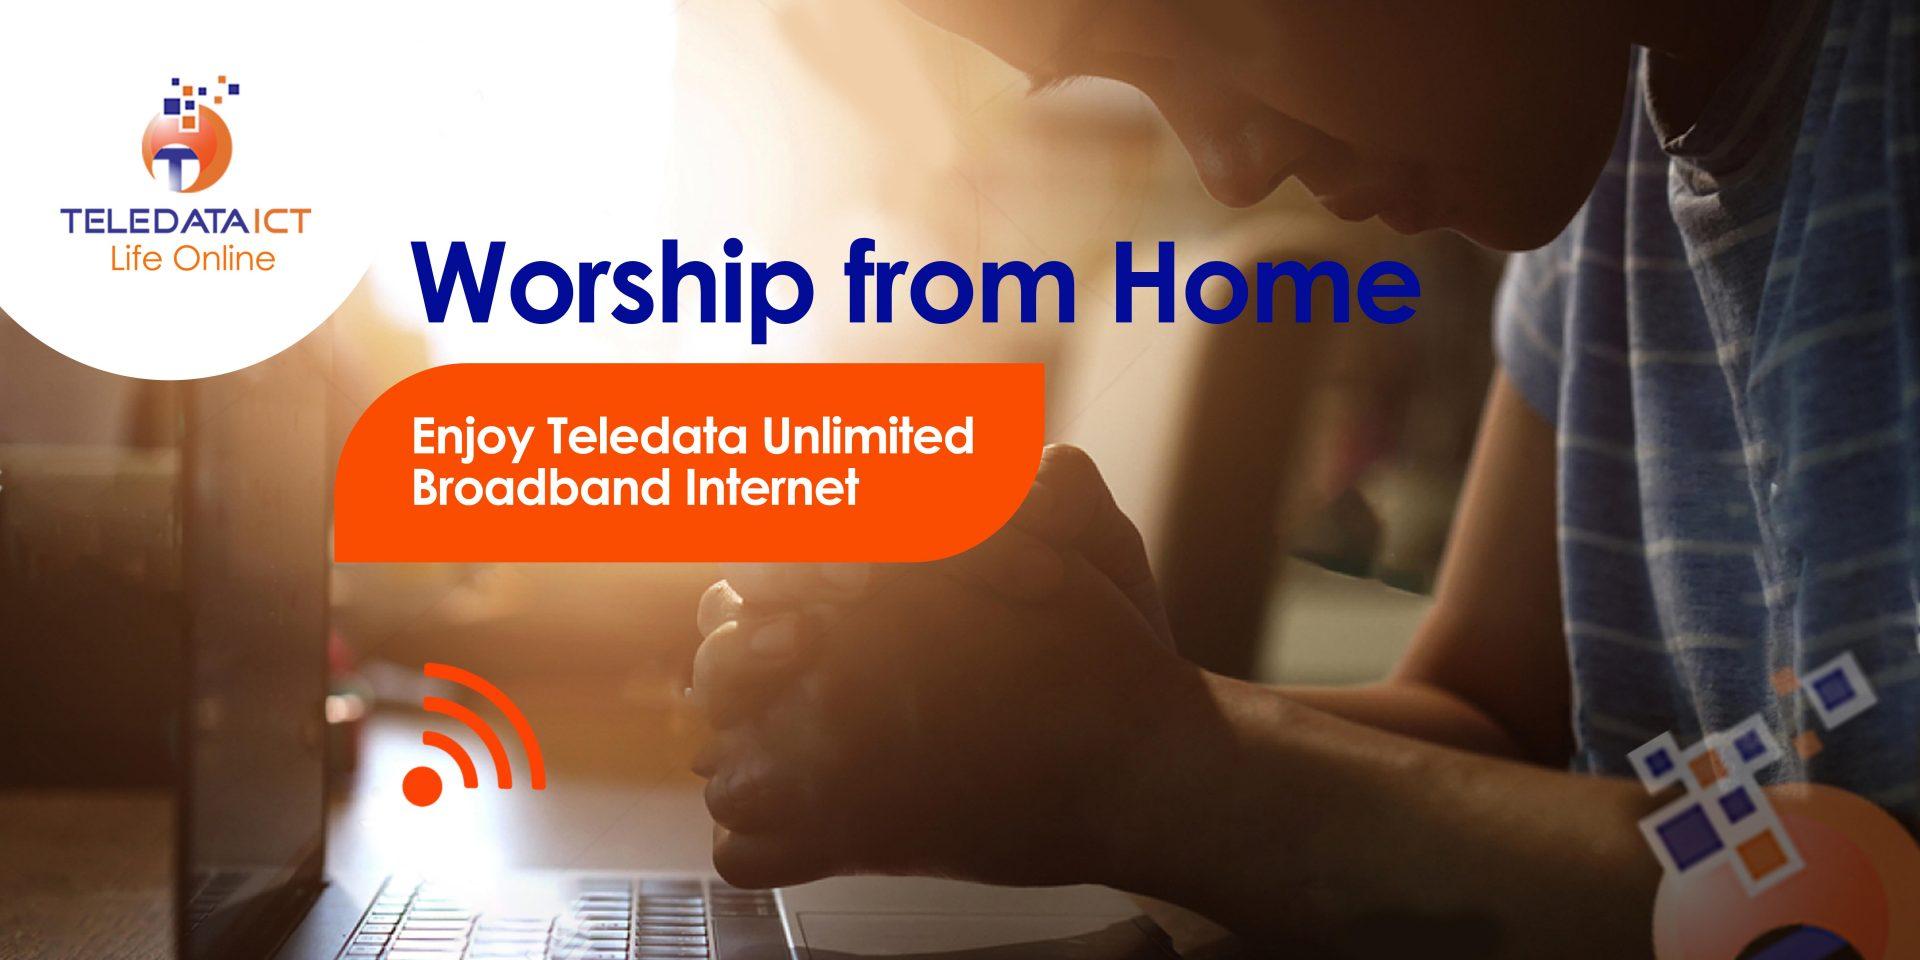 unlimited internet online worship